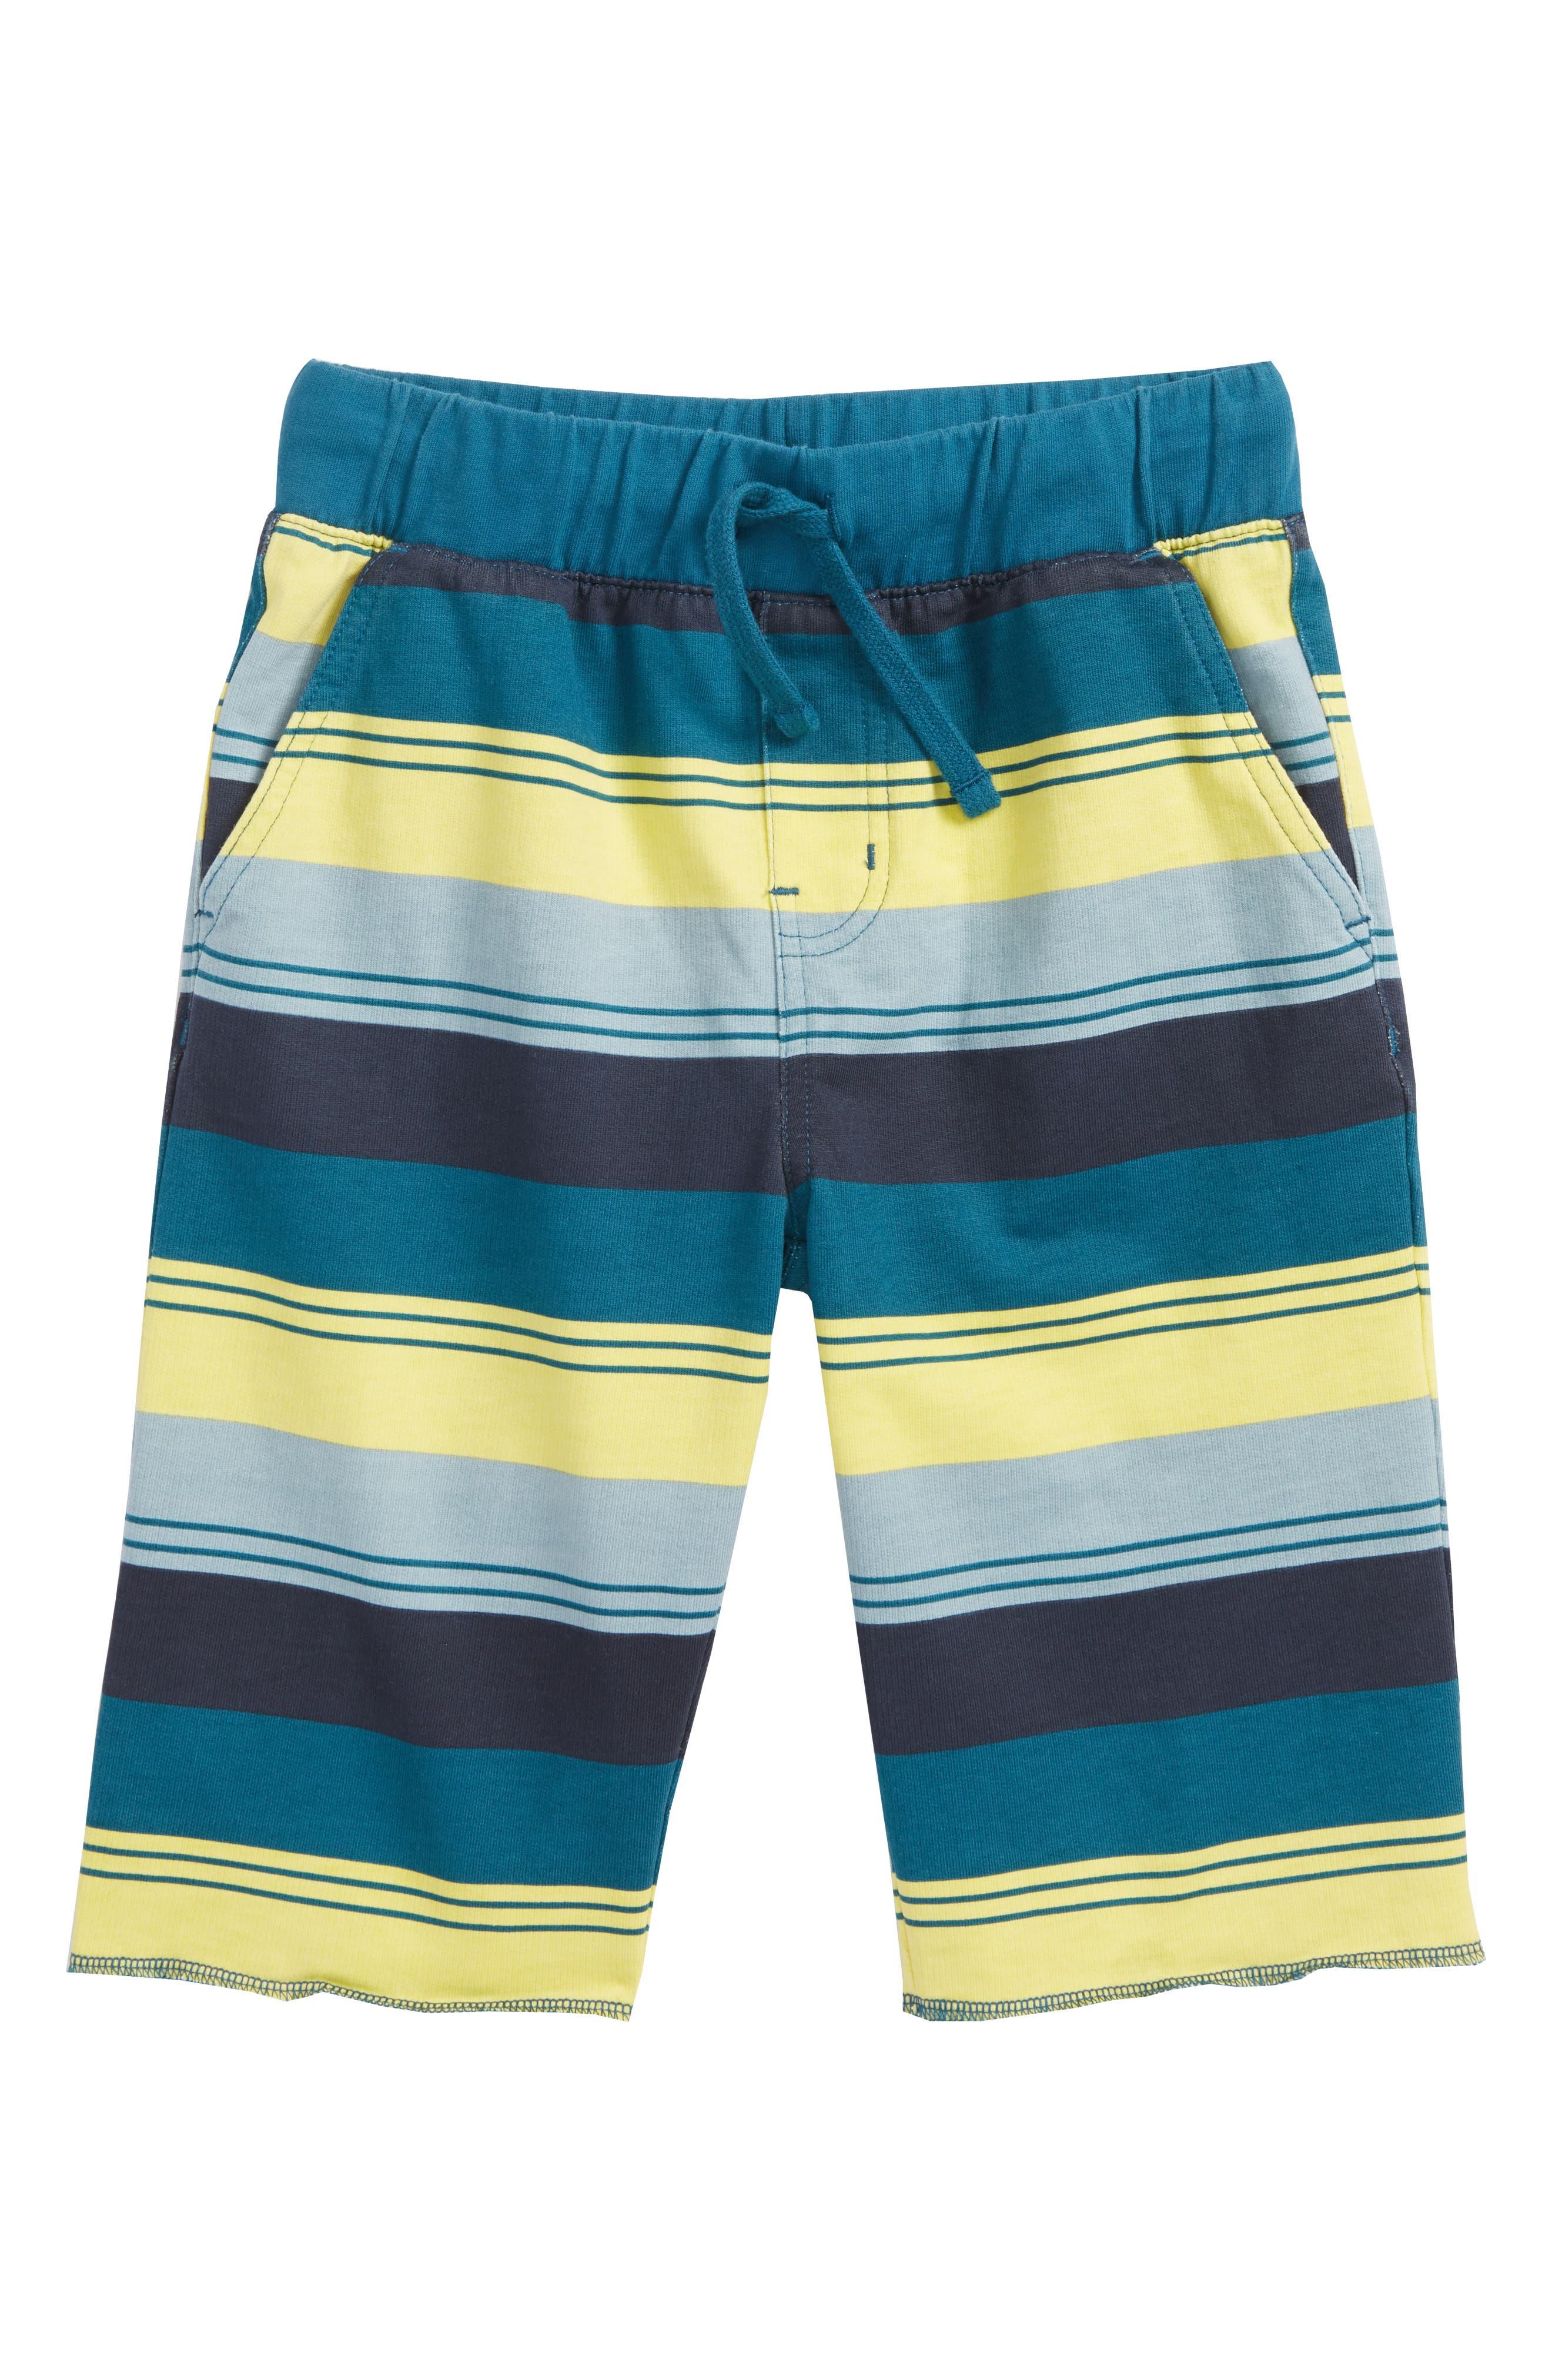 Cruiser Print Shorts,                         Main,                         color, Indigo Tri-Stripe